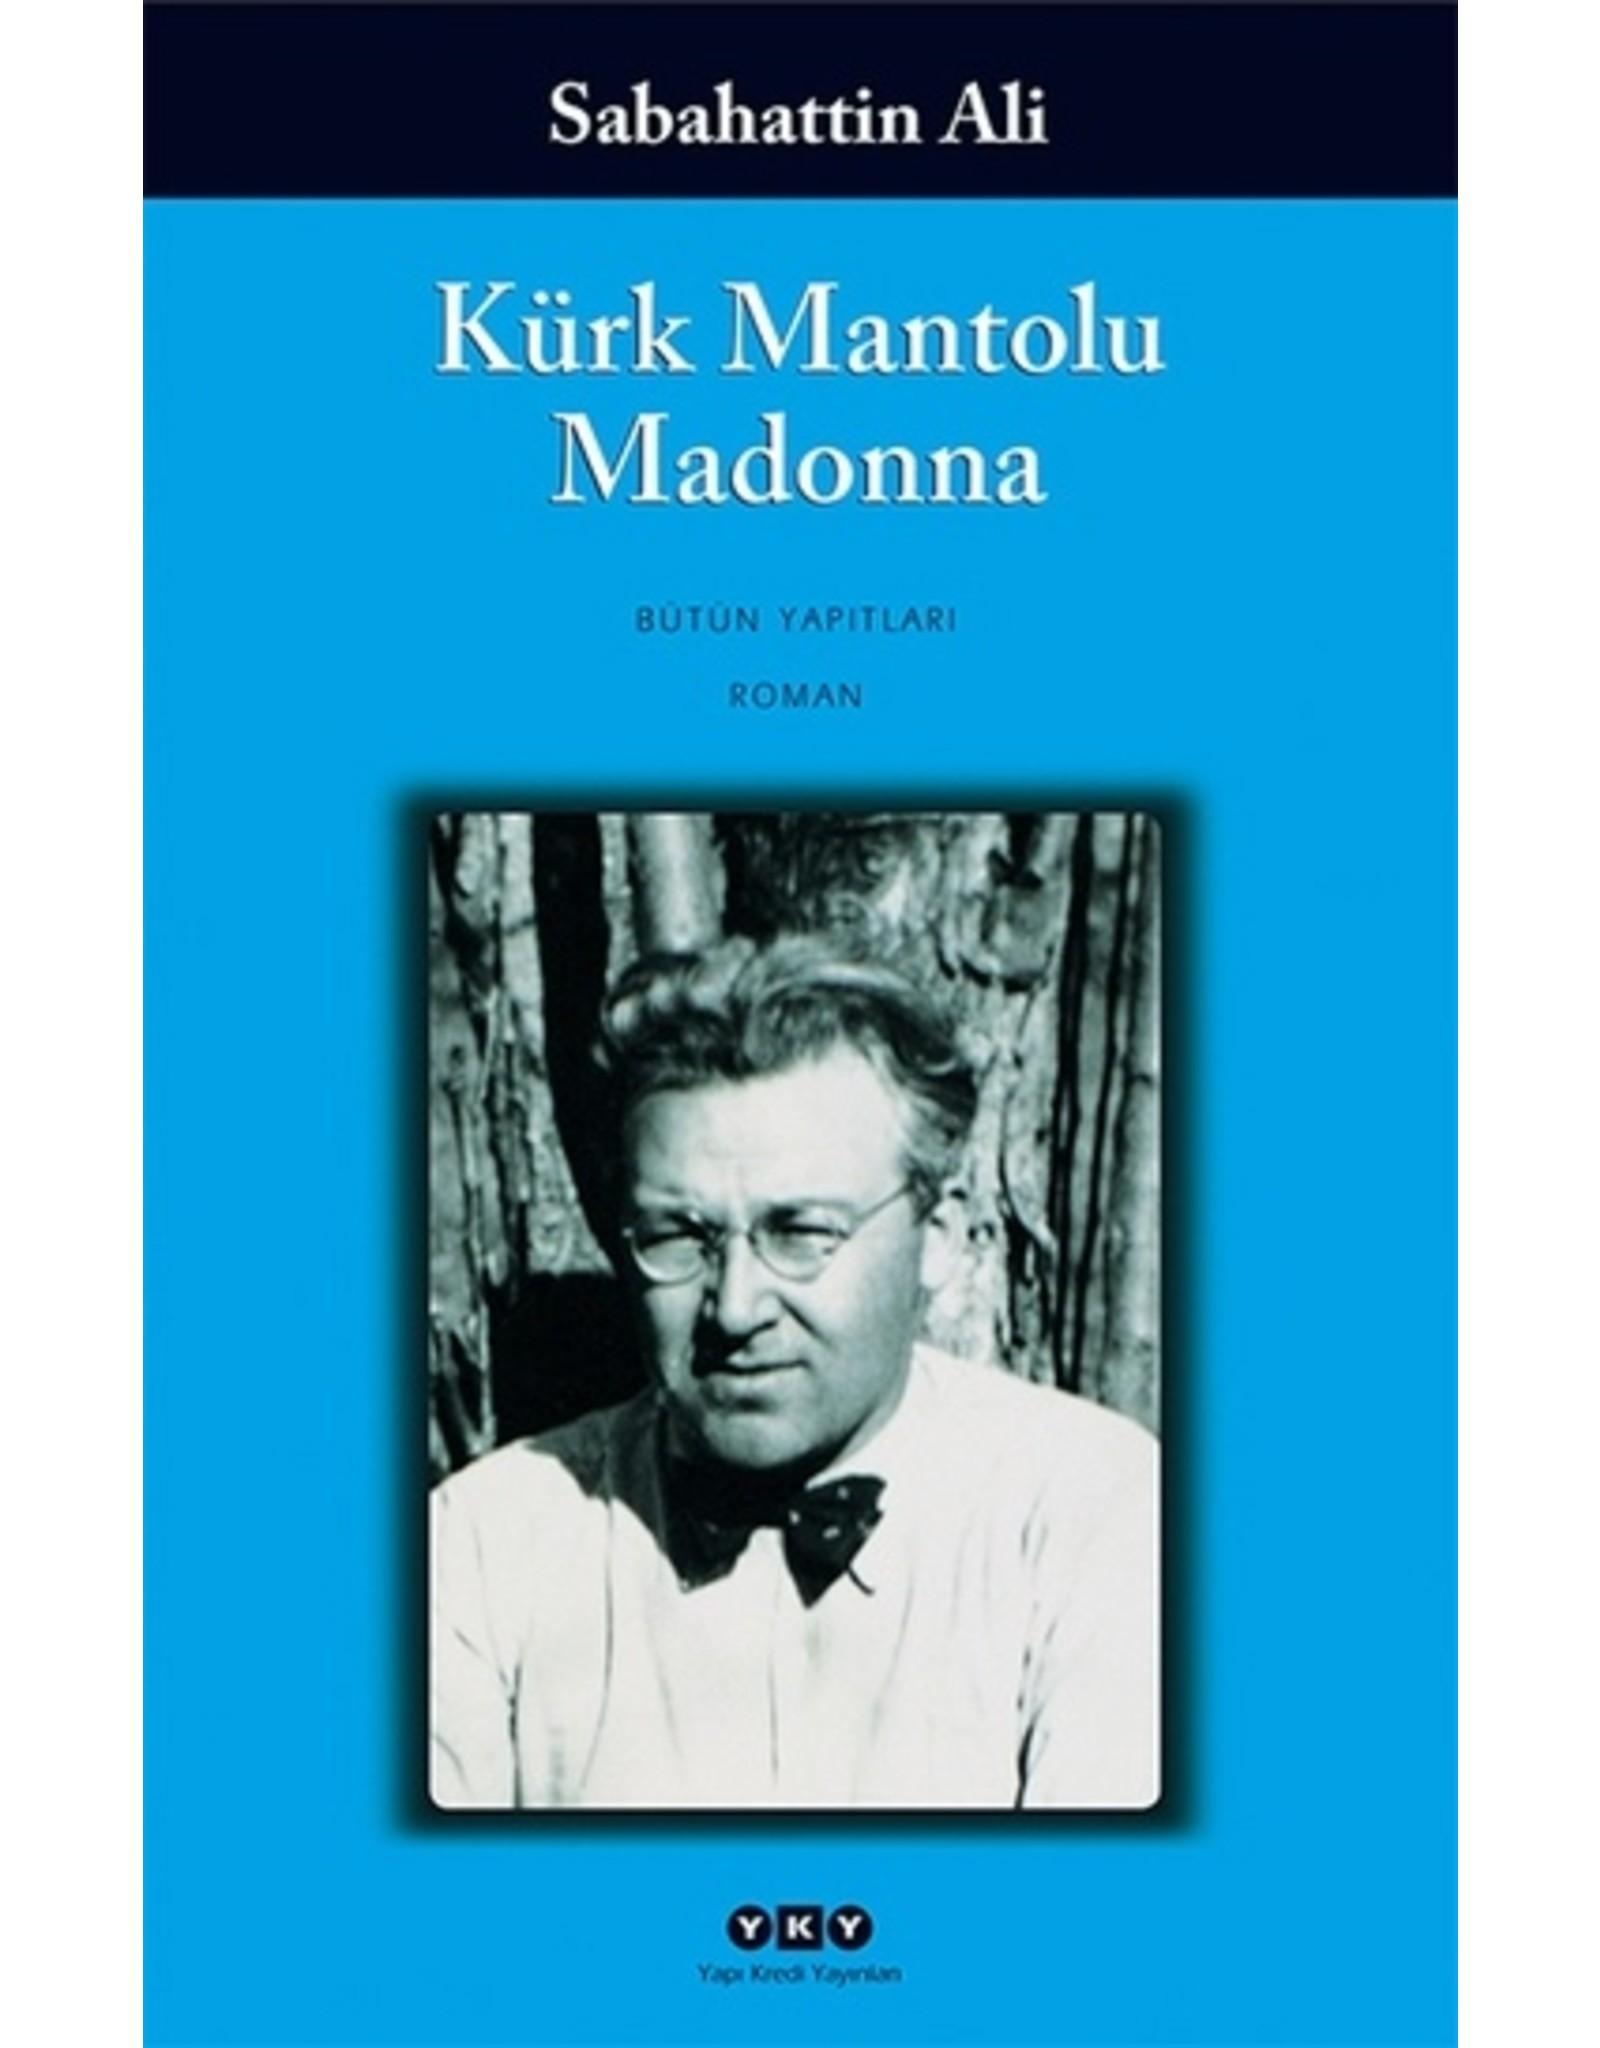 Sabahattin Ali Kürk Mantolu Madonna